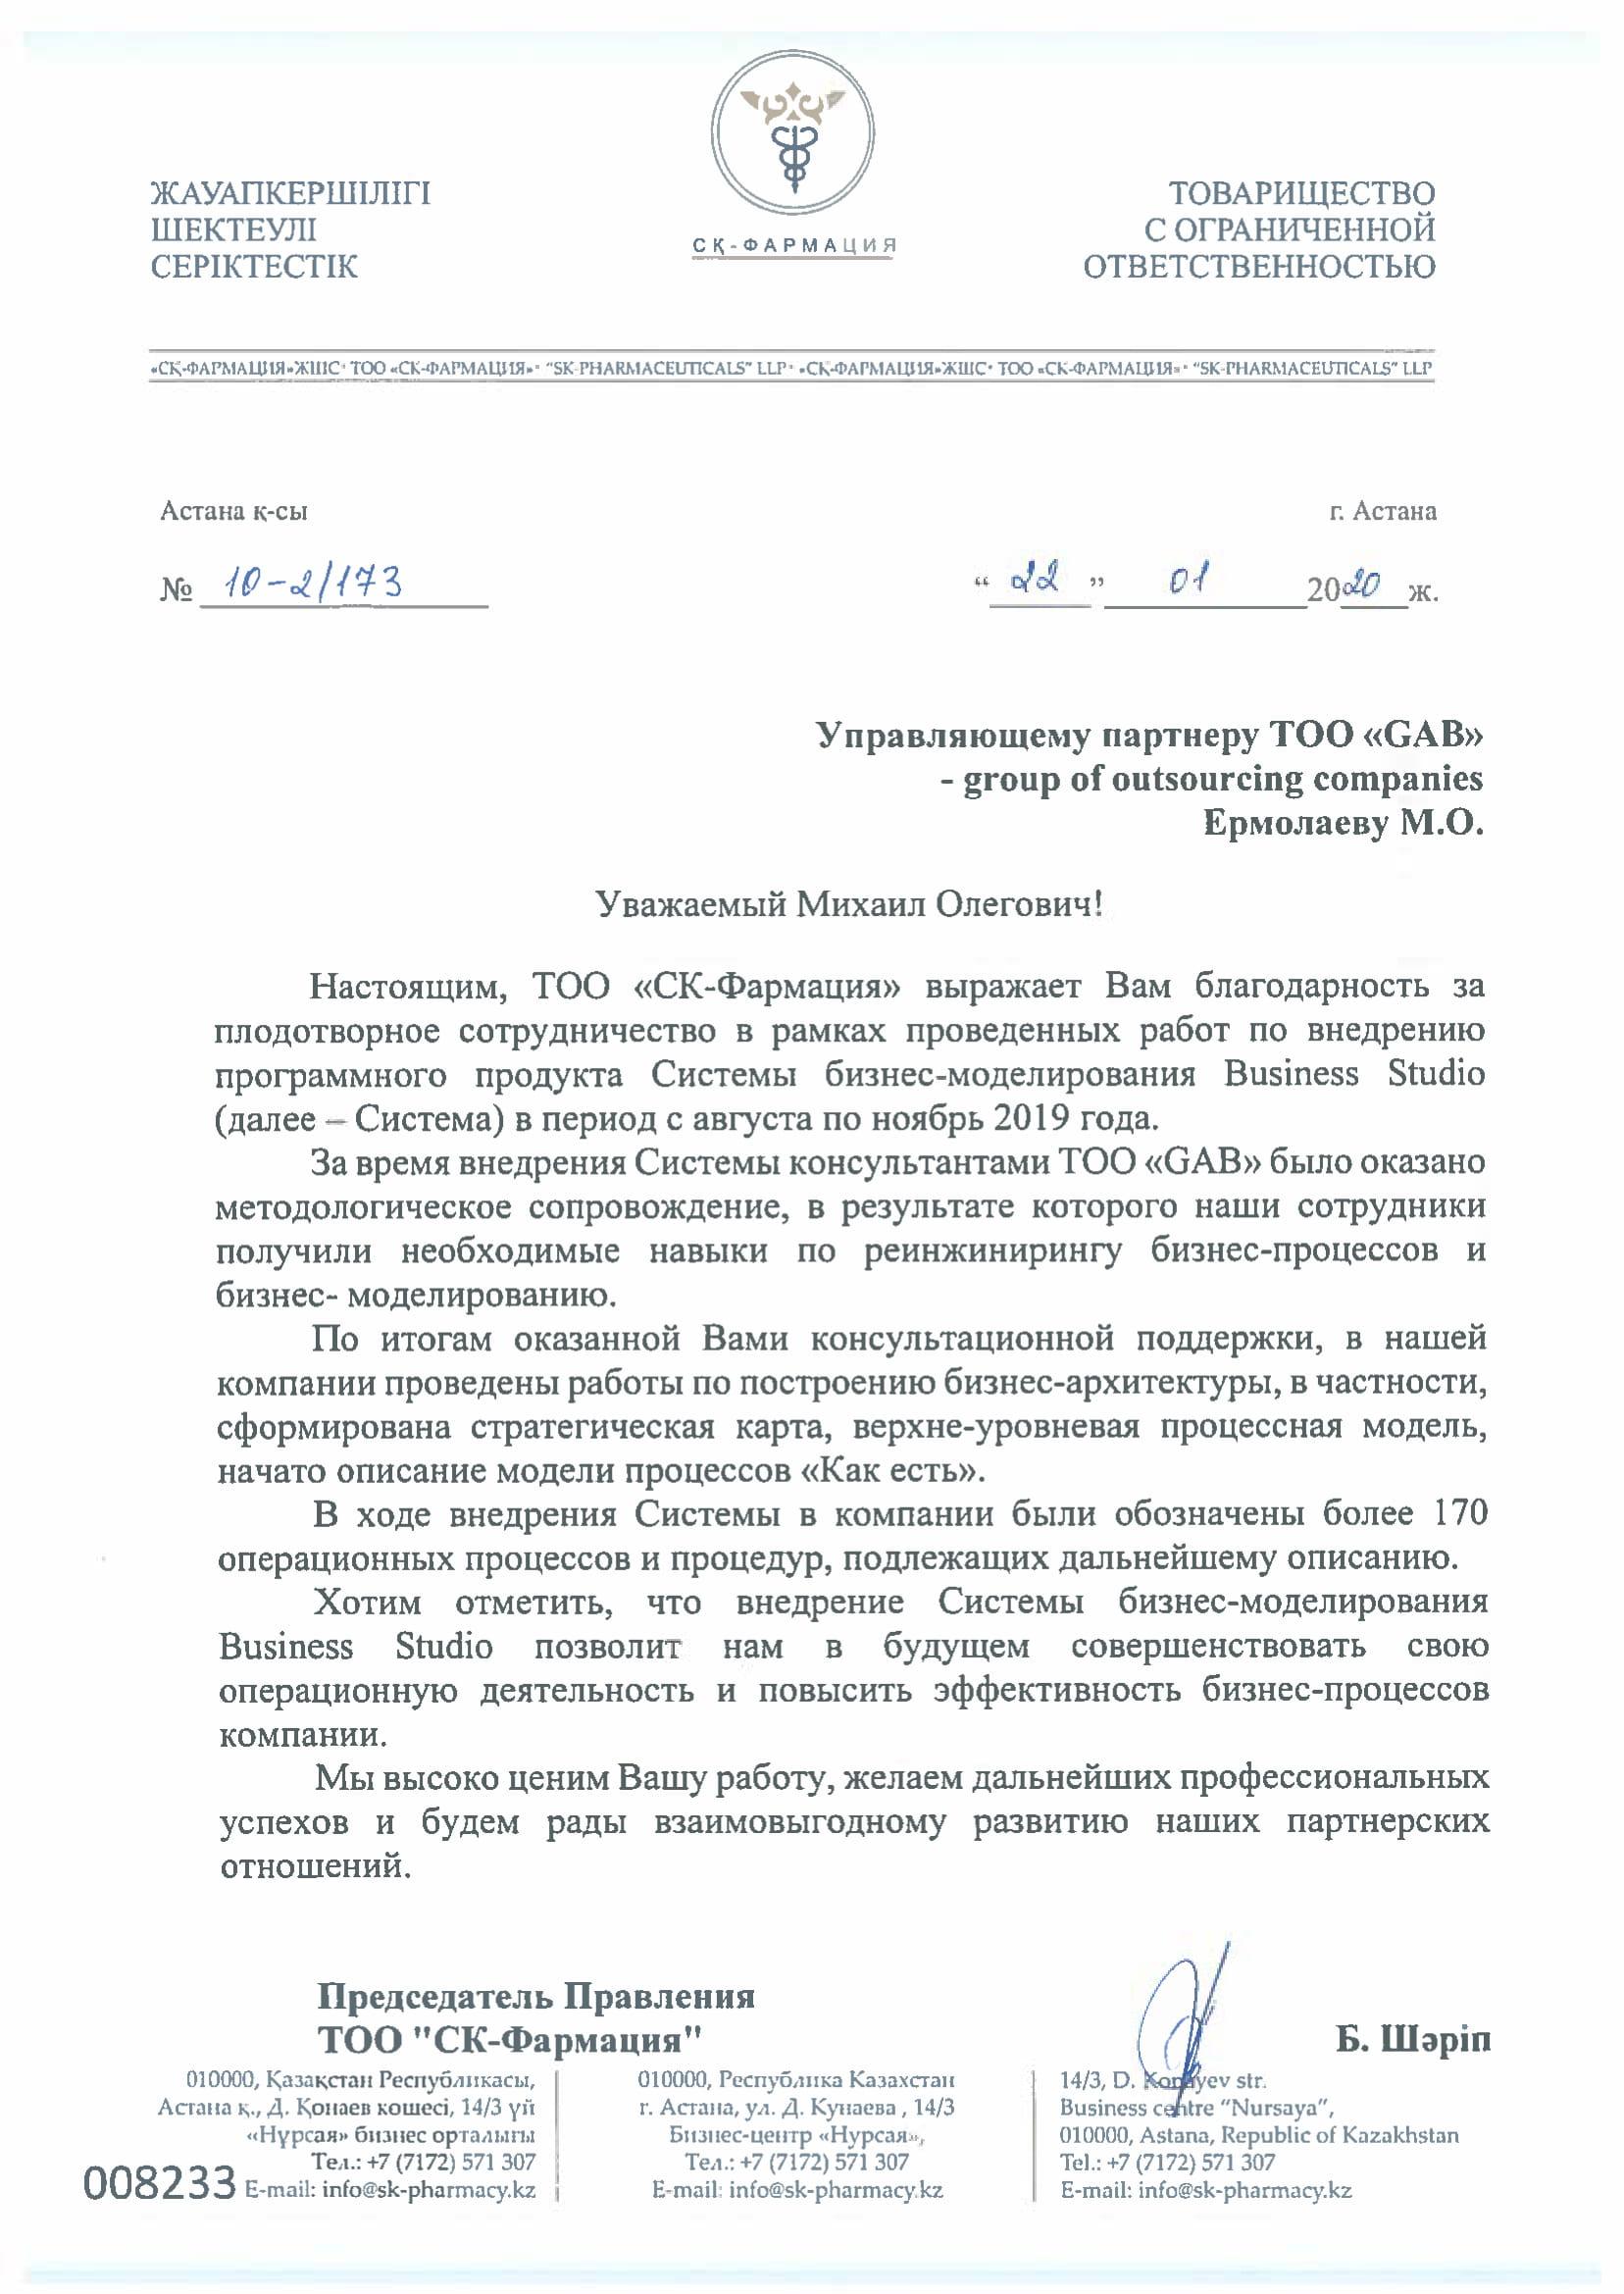 BS ТОО СК-Фармация